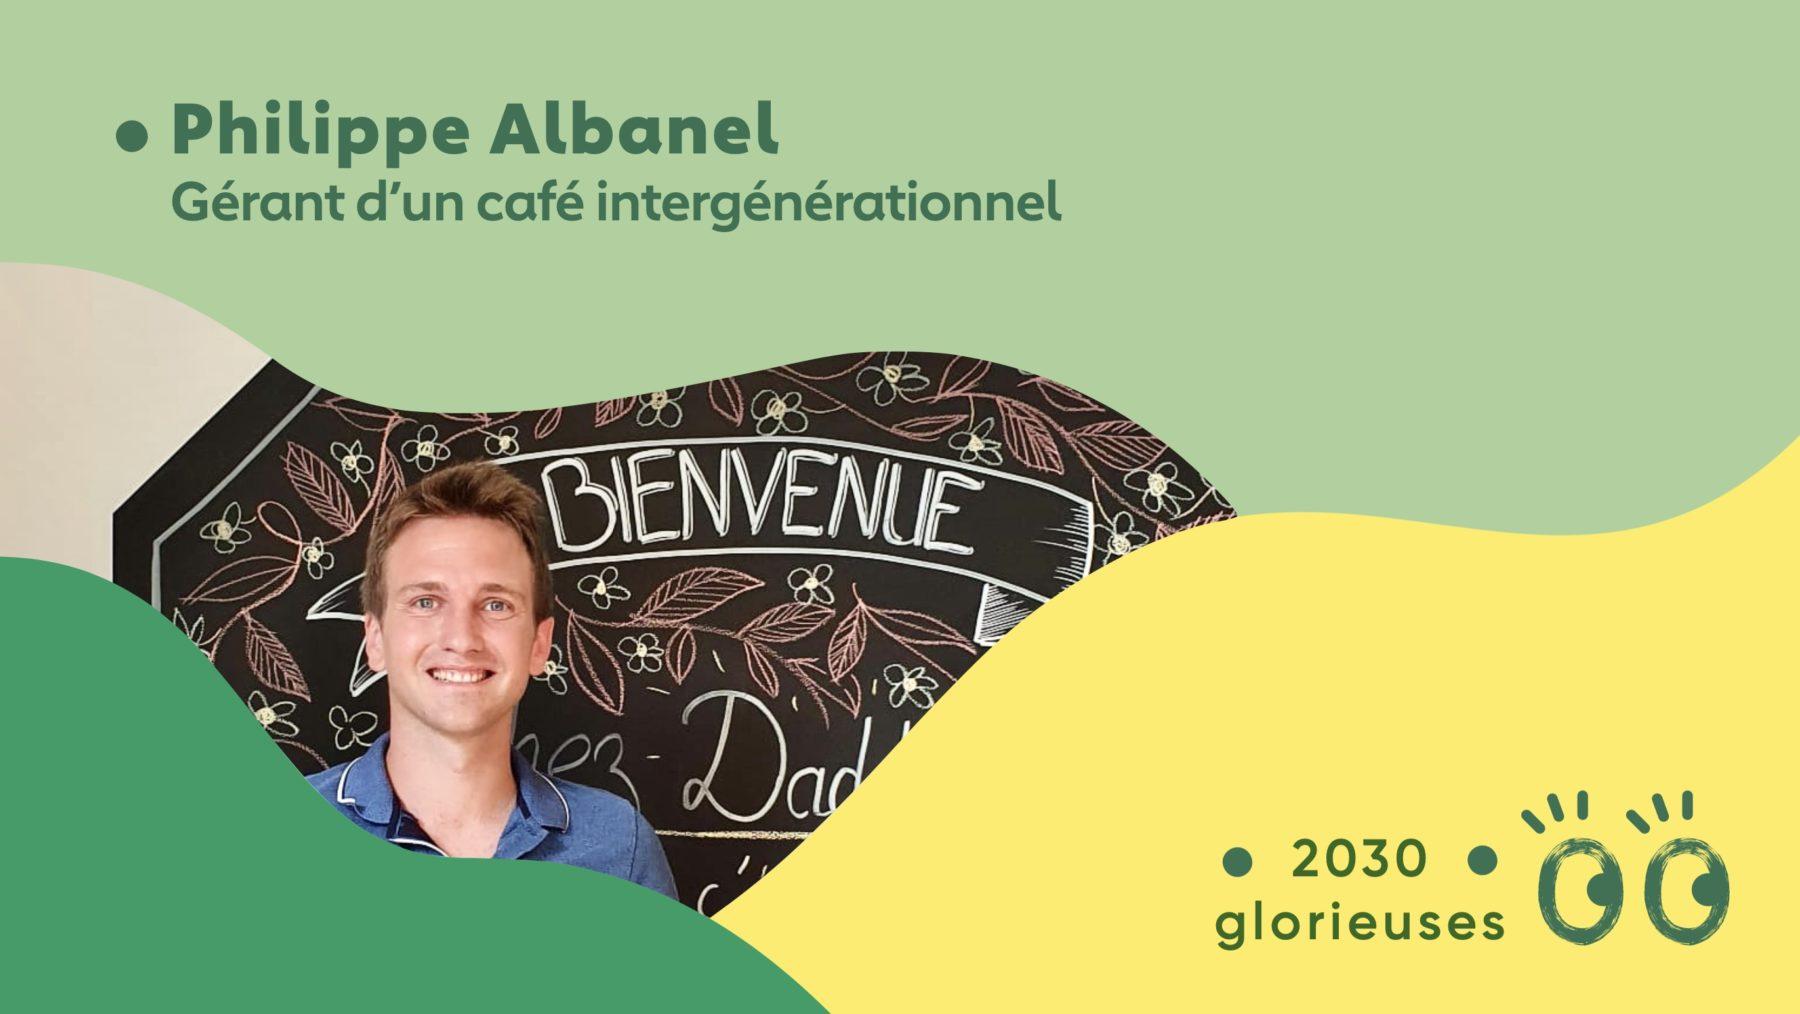 2030 Glorieuses #44 : Philippe Albanel